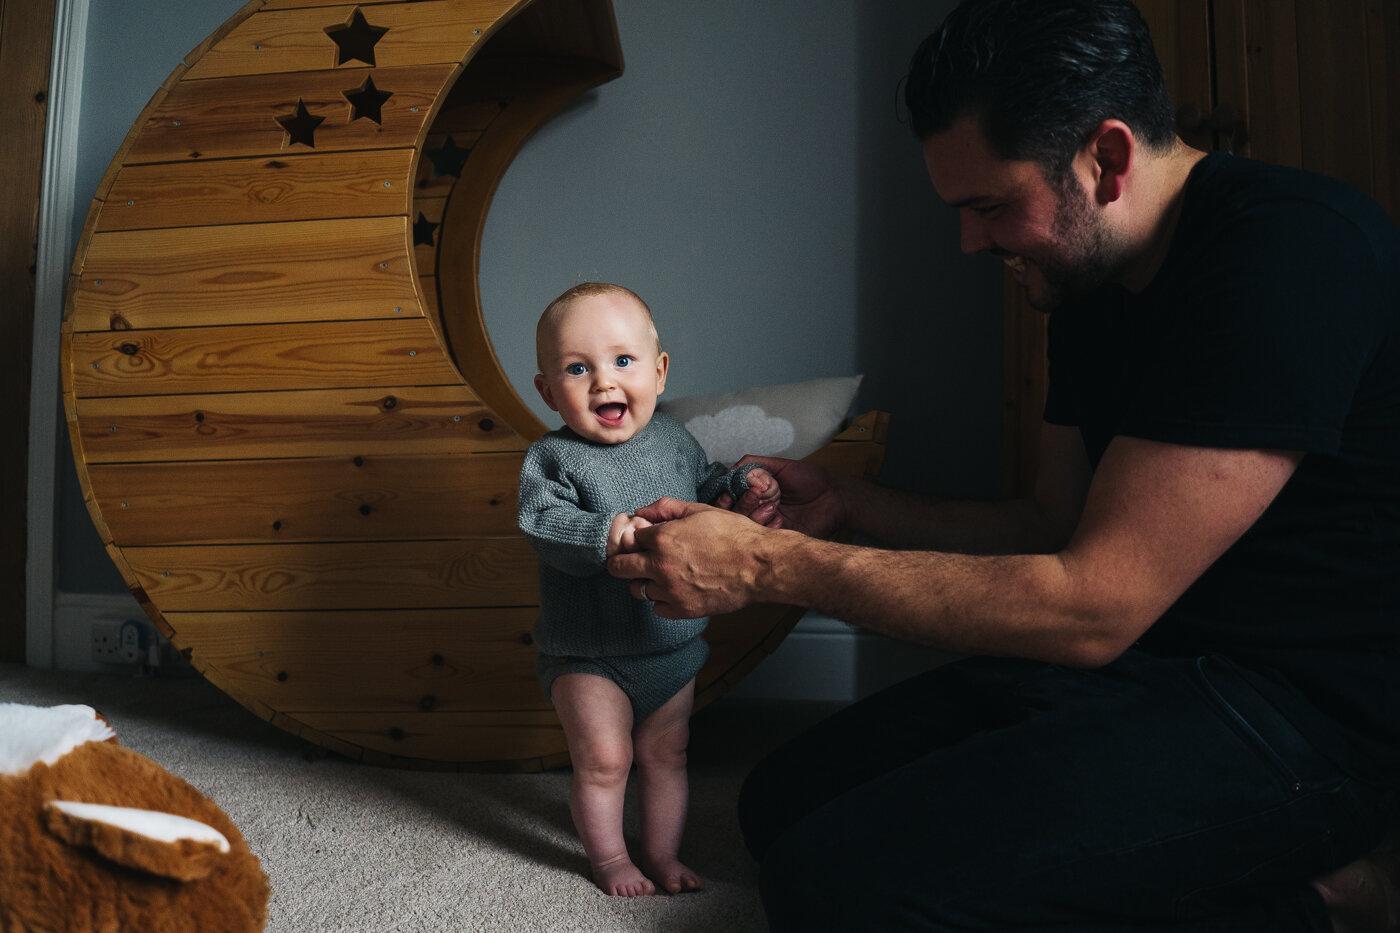 family-photography-teesside-north-yorkshire-newborn-baby-family-shoot-0009.jpg